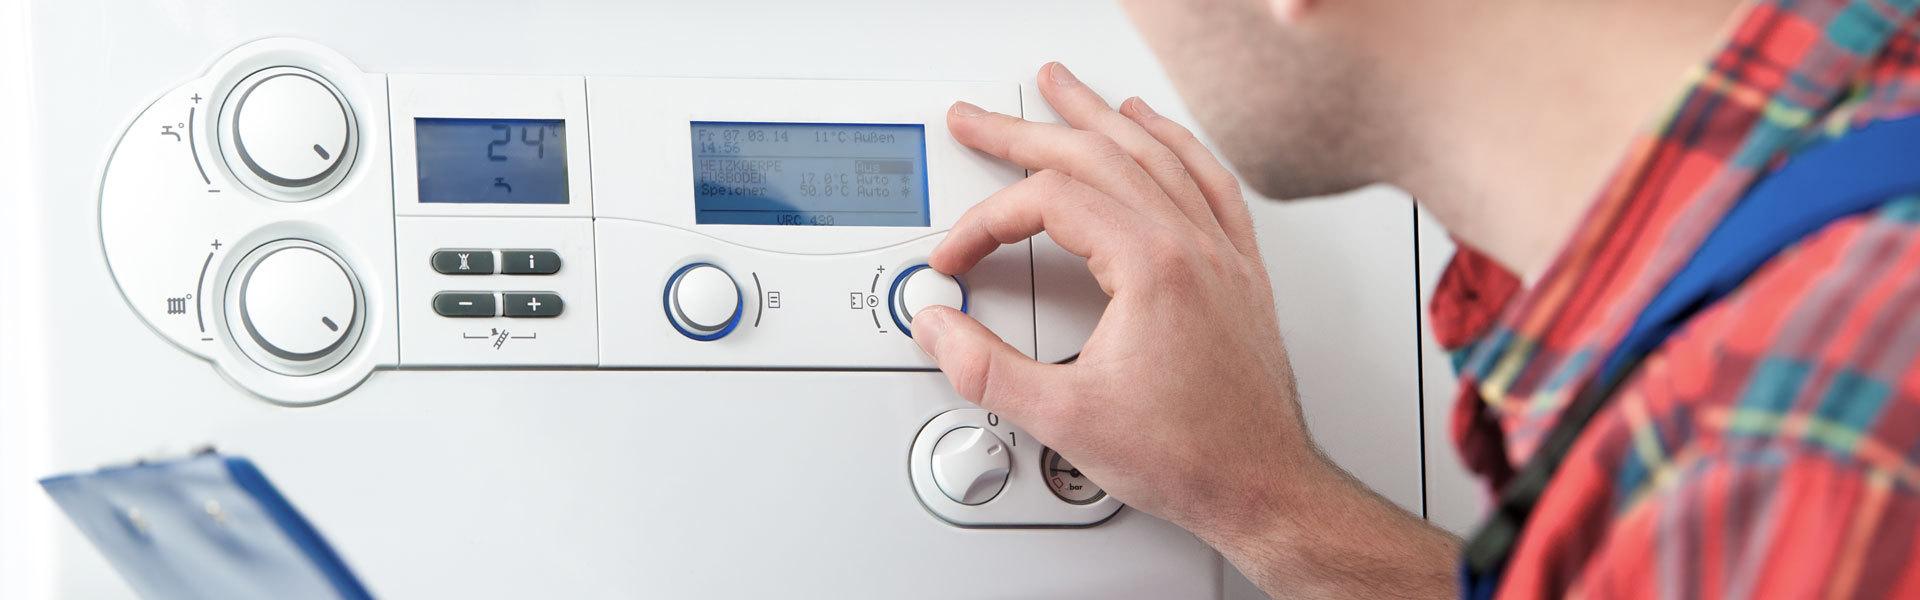 Servicio Técnico de Electrodomésticos Bosch en Sevilla